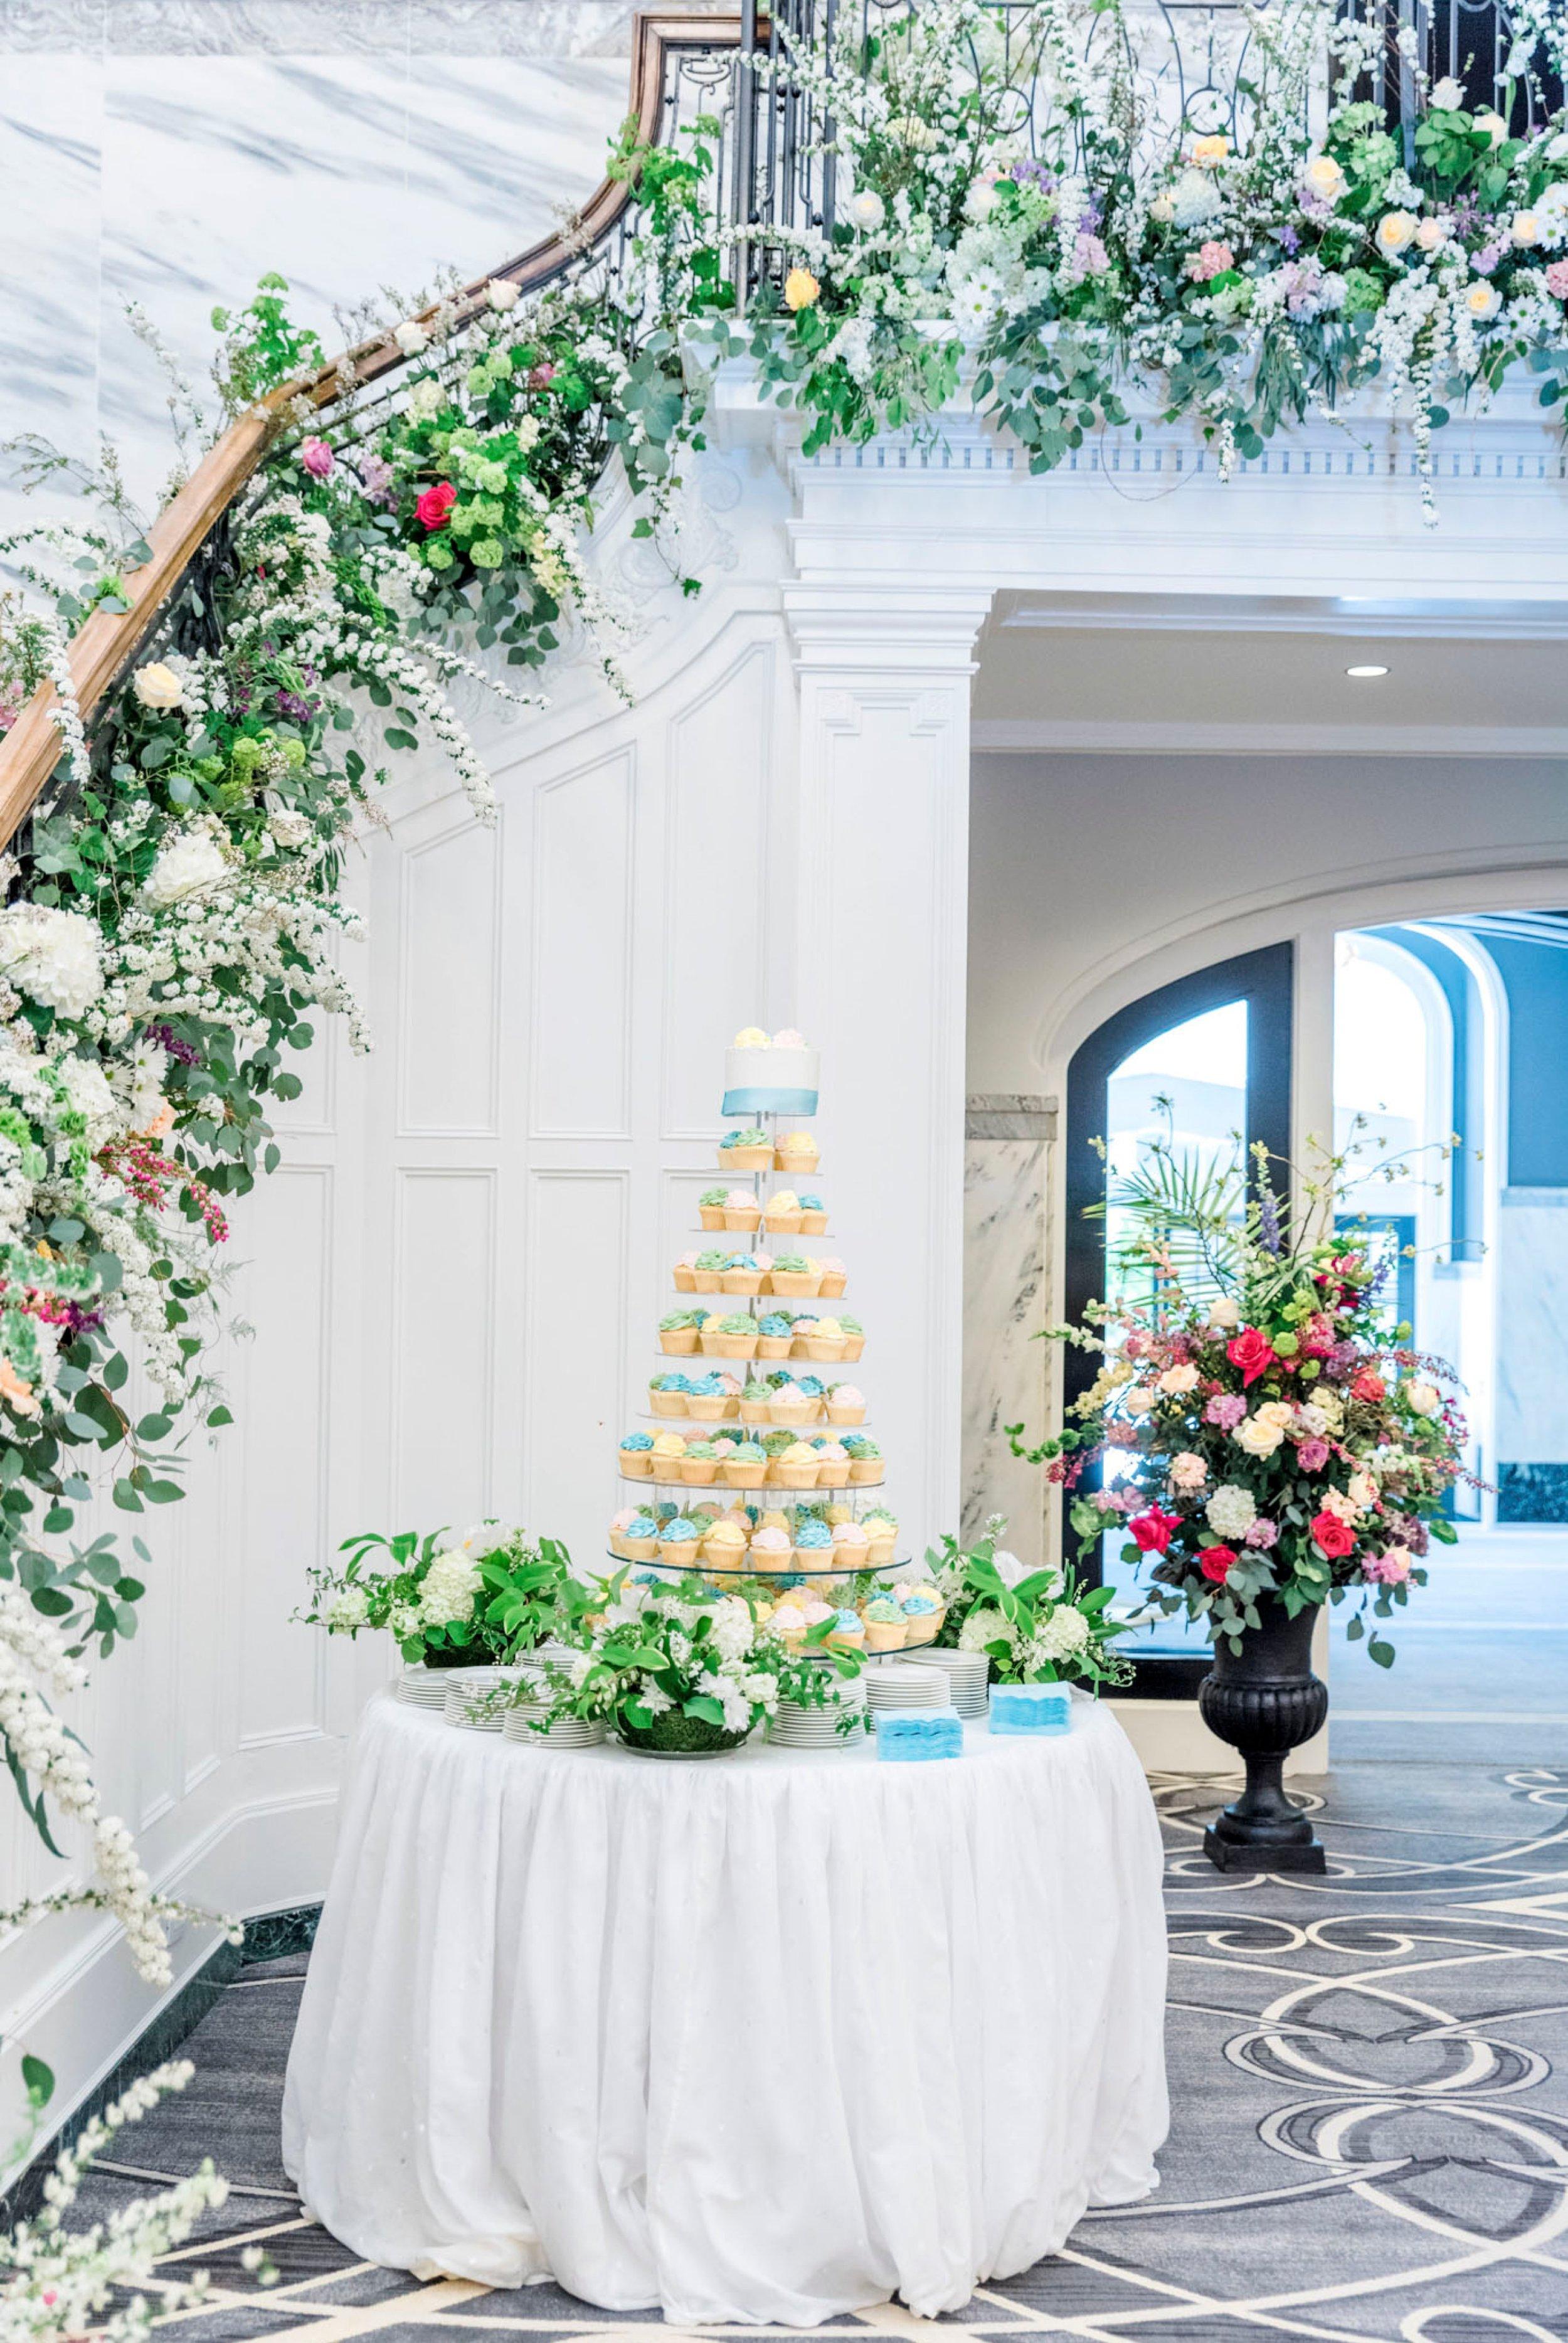 TheVirginianHotel_LynchburgVA_TheVirginianHotelWedding_Virginiaweddingphotographer_Lynchburgvawedding 14.jpg